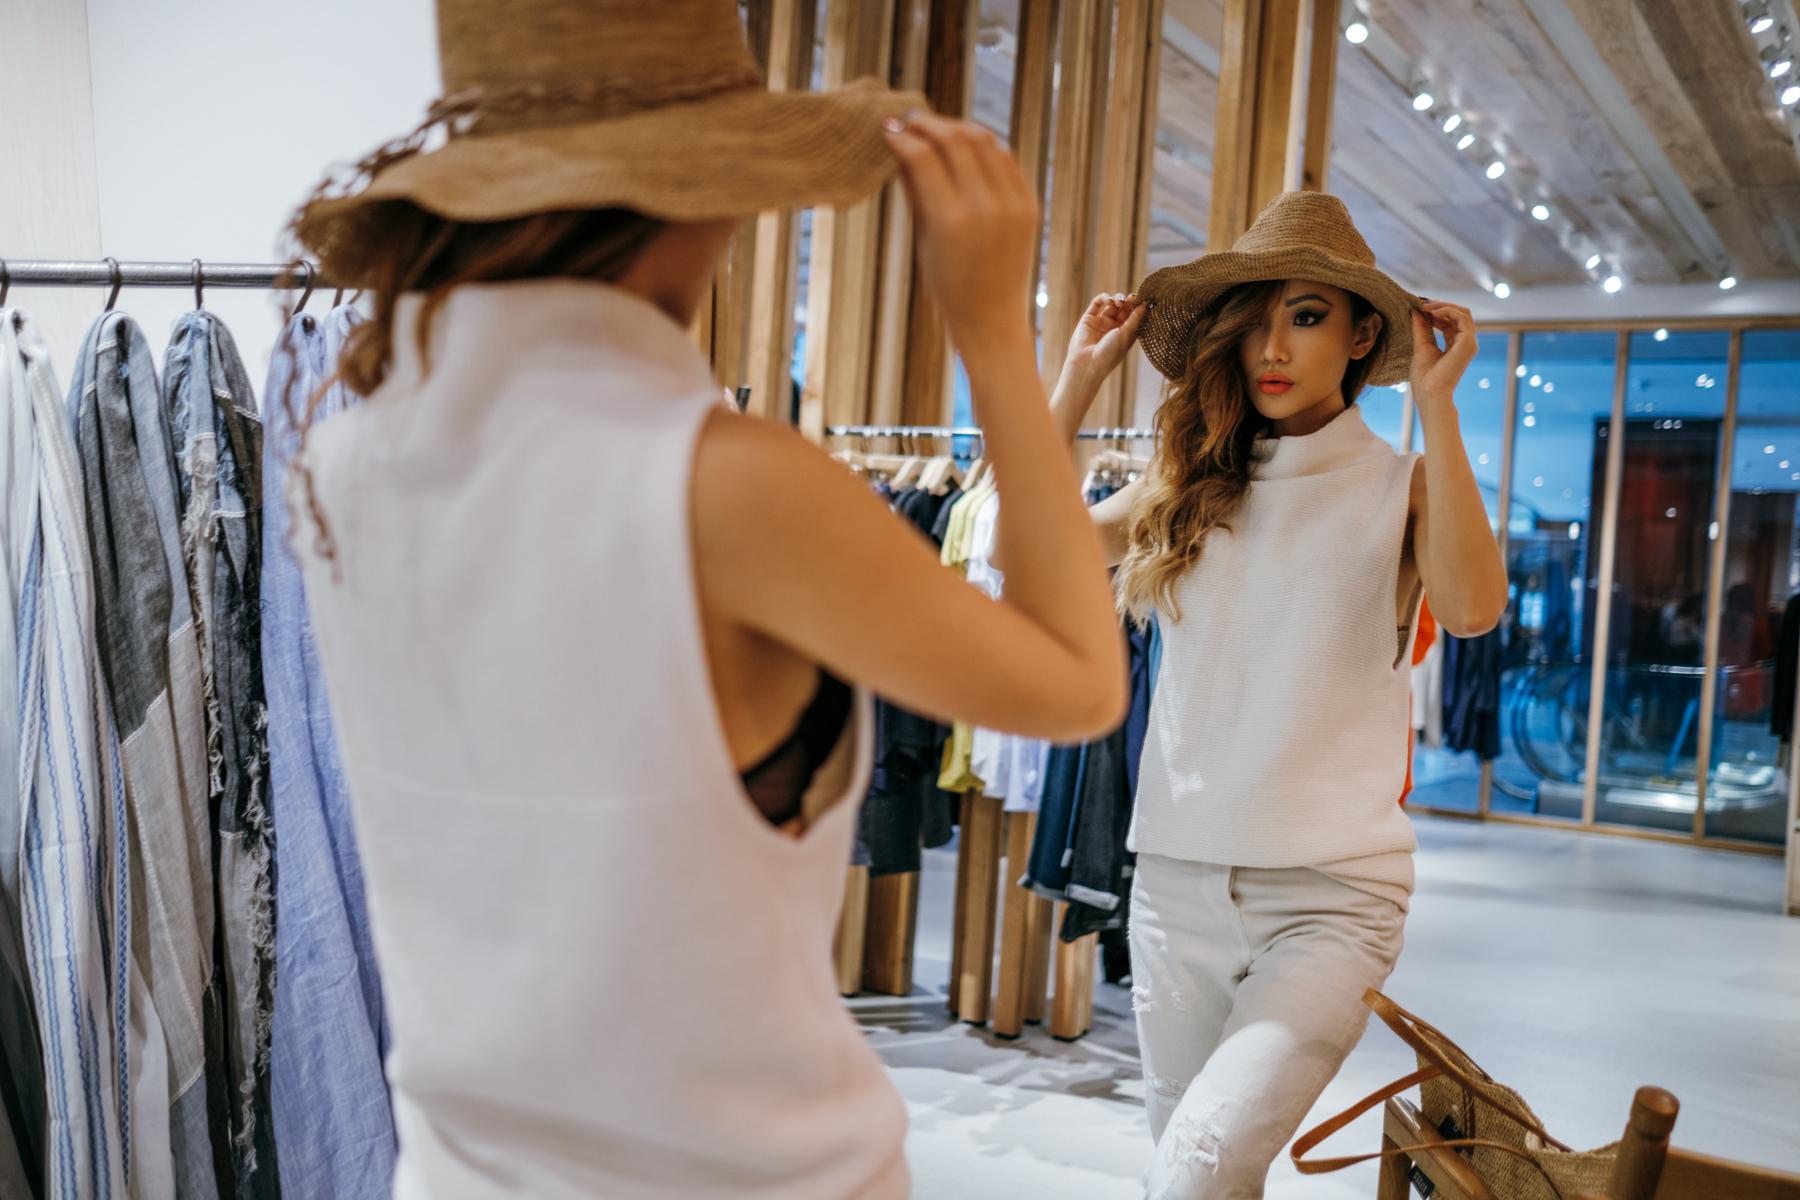 nyc-columbus-circle-shop-mall-notjessfashion-top-nyc-fashion-blogger-006